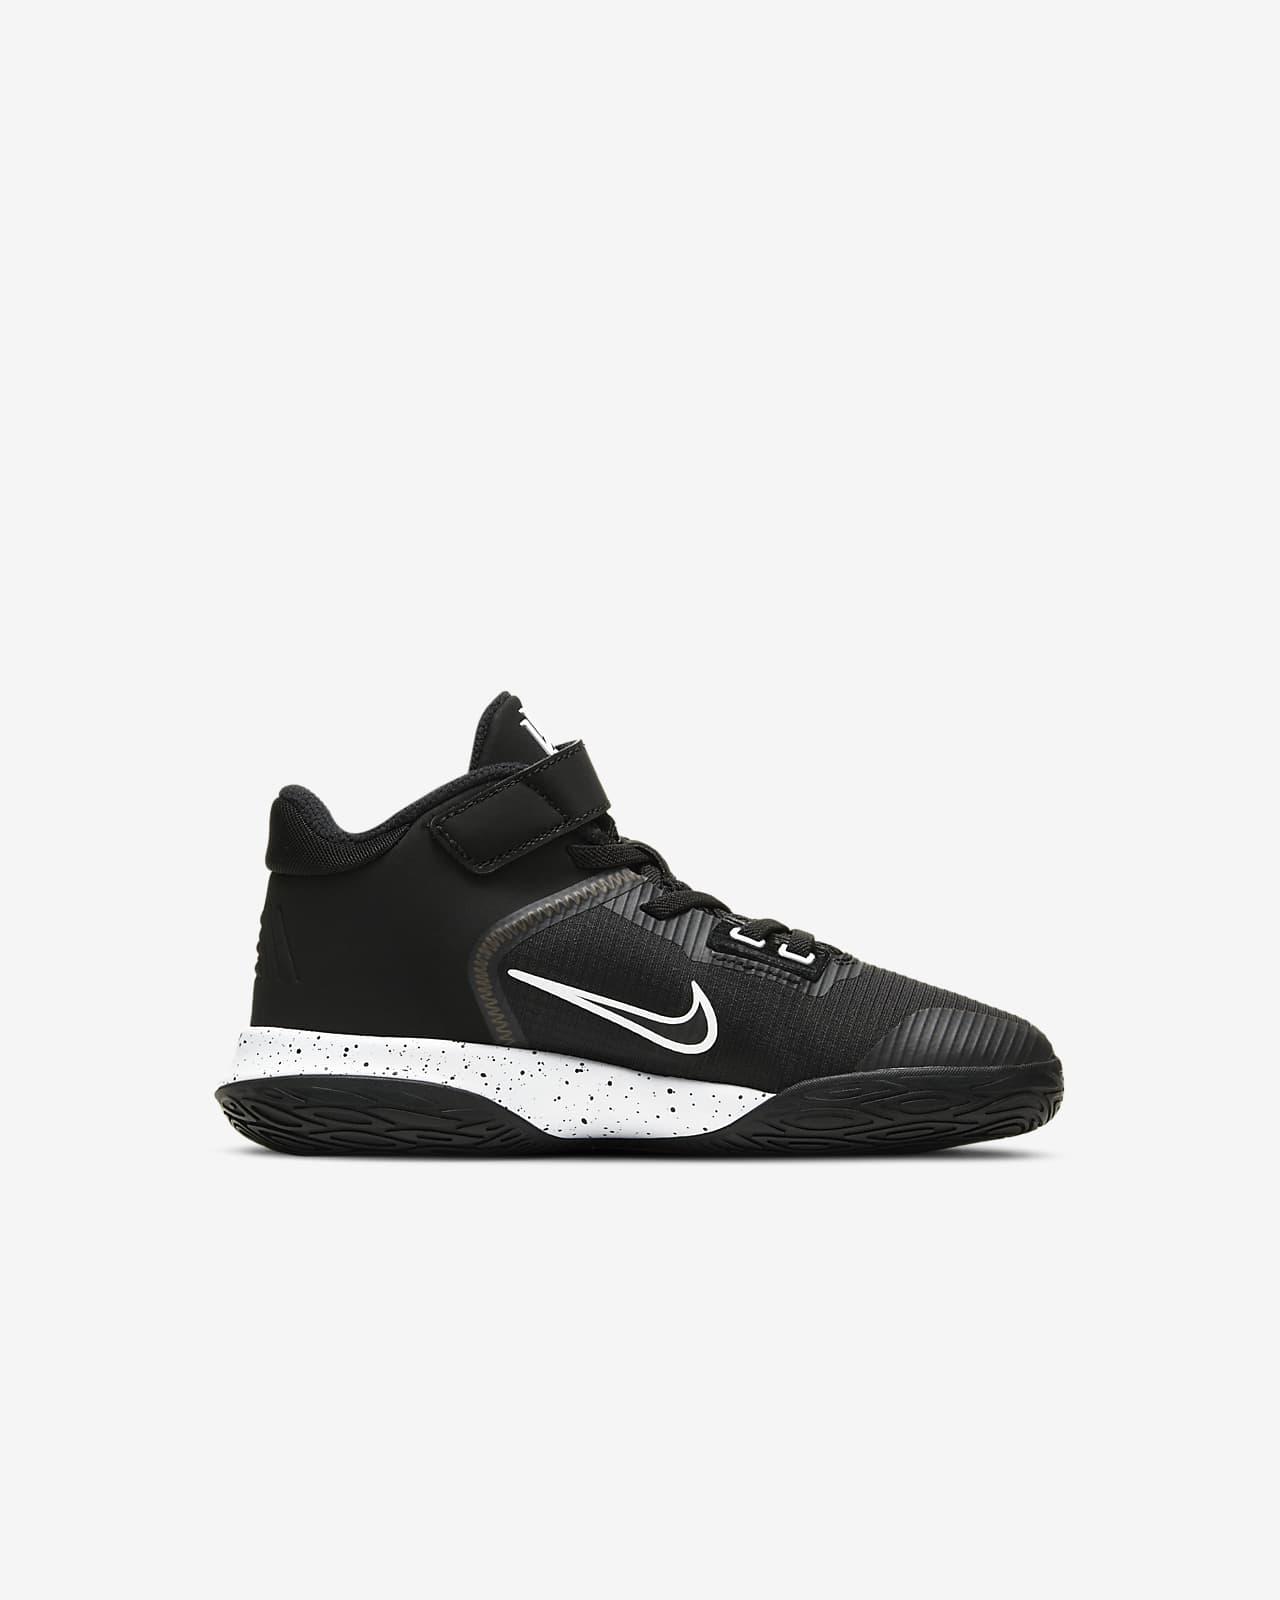 Kyrie Flytrap 4 Younger Kids' Shoe. Nike ID